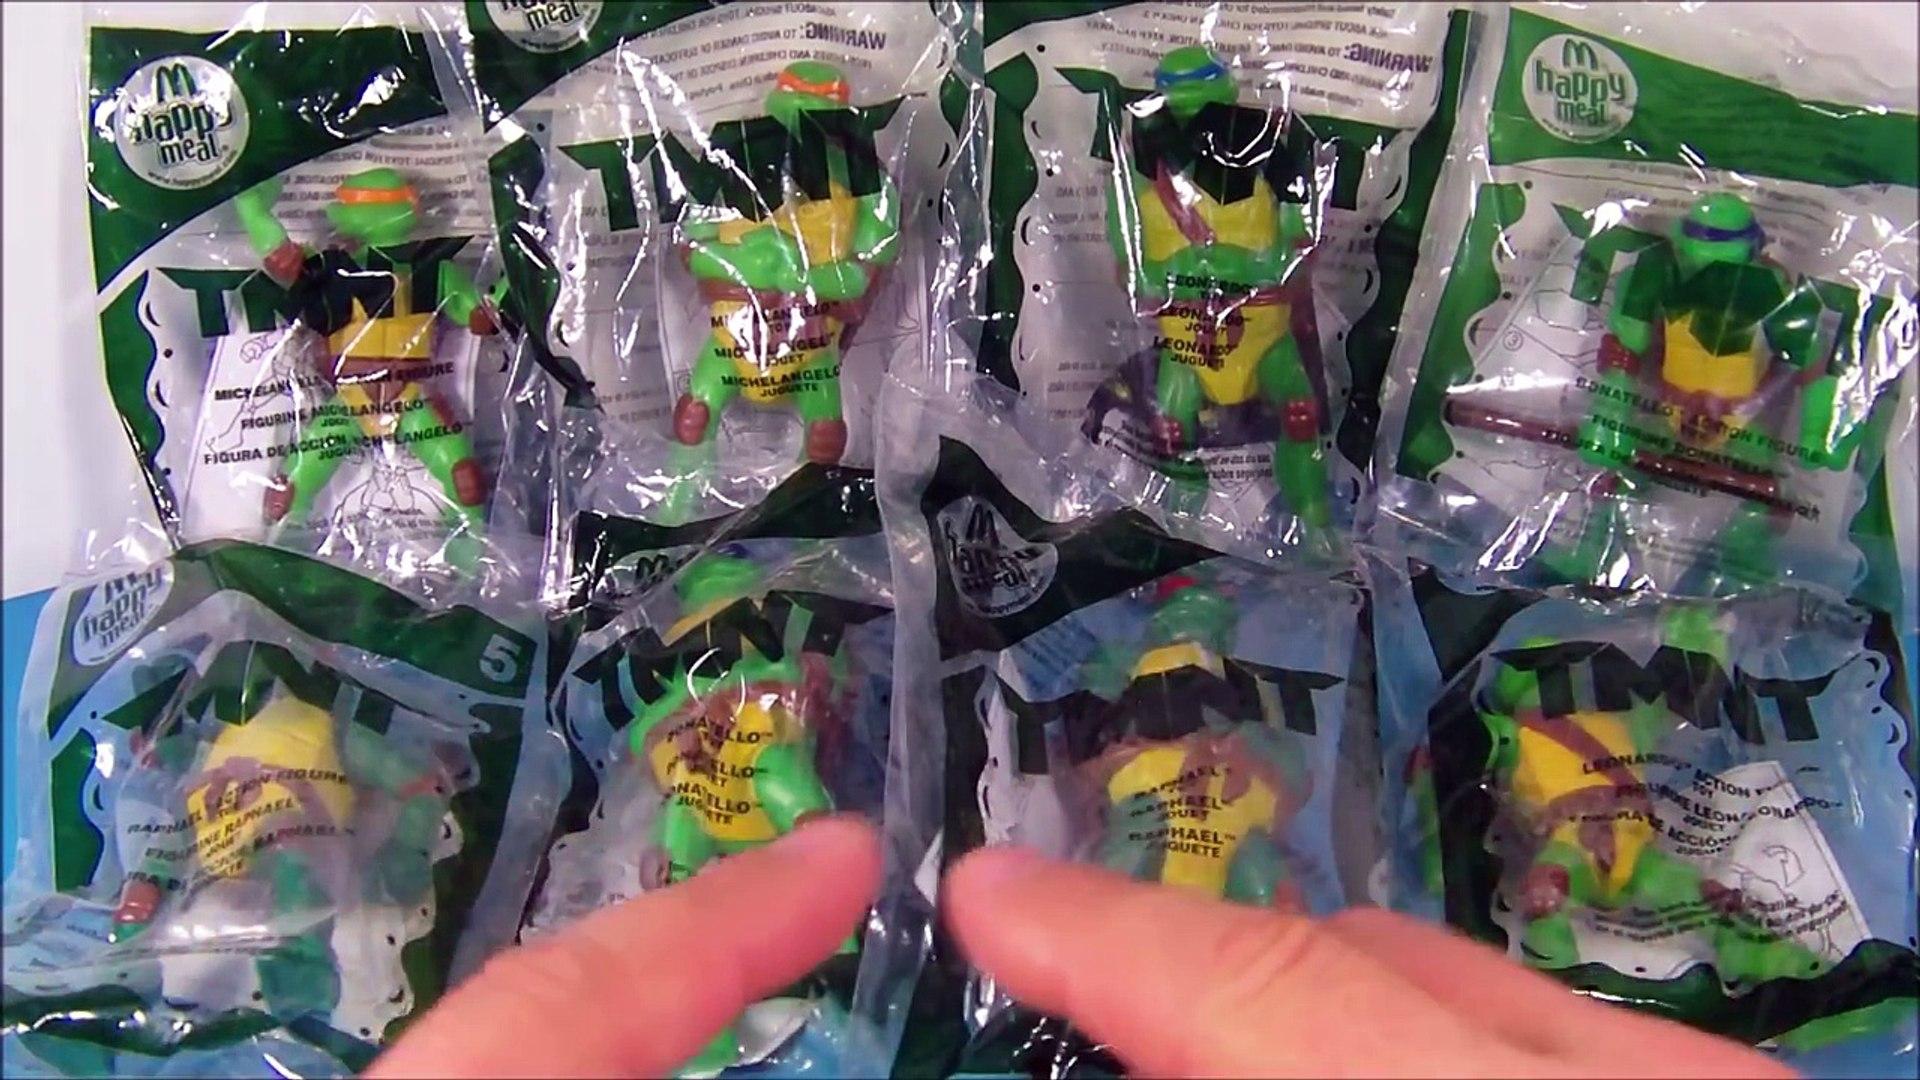 2007 Teenage Mutant Ninja Turtles Set Of 8 Mcdonalds Happy Meal Kids Toys Video Review 動画 Dailymotion